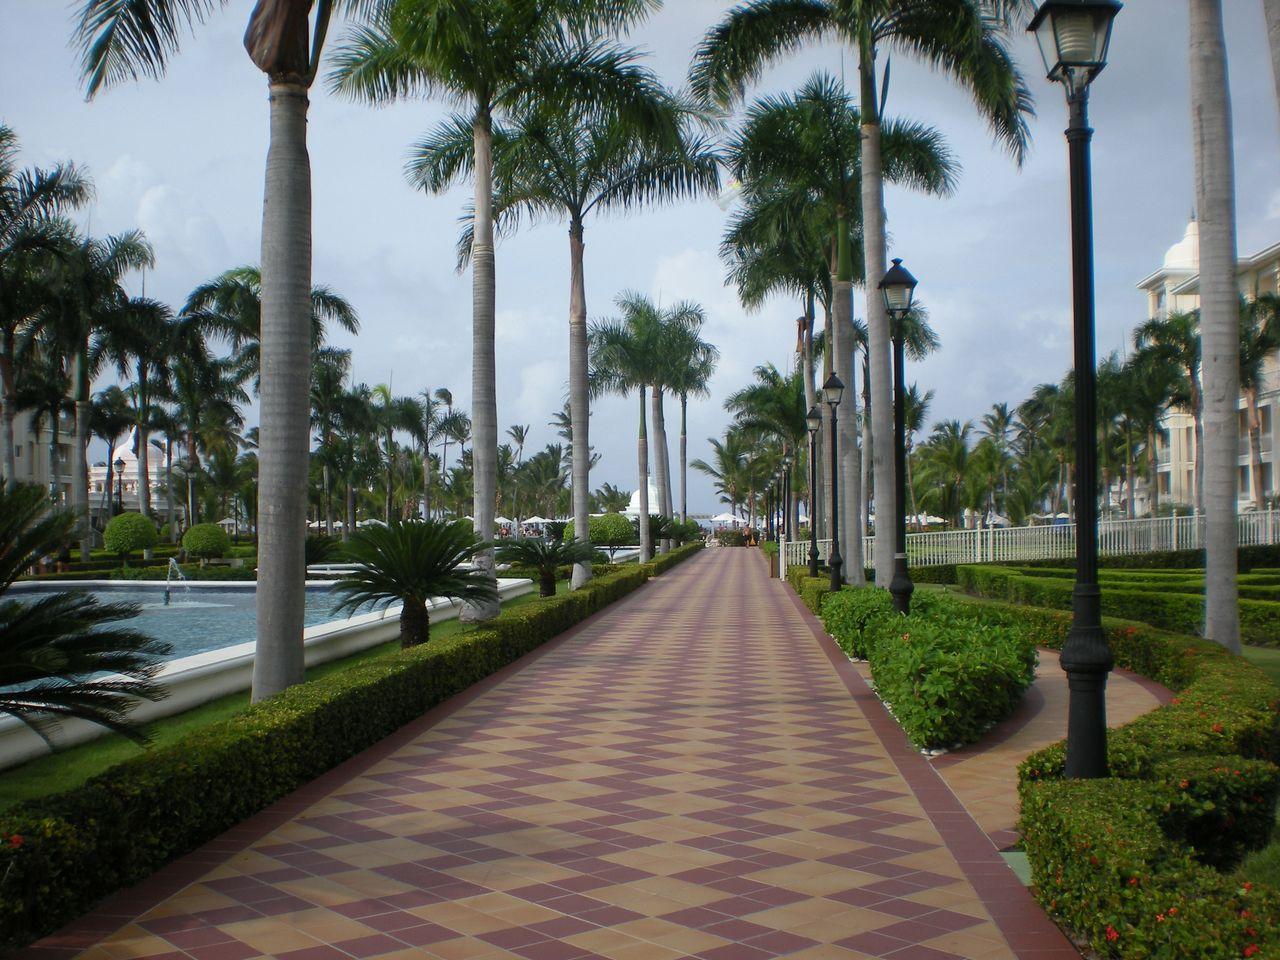 Riu walkway Punta Cana | Cordier Events